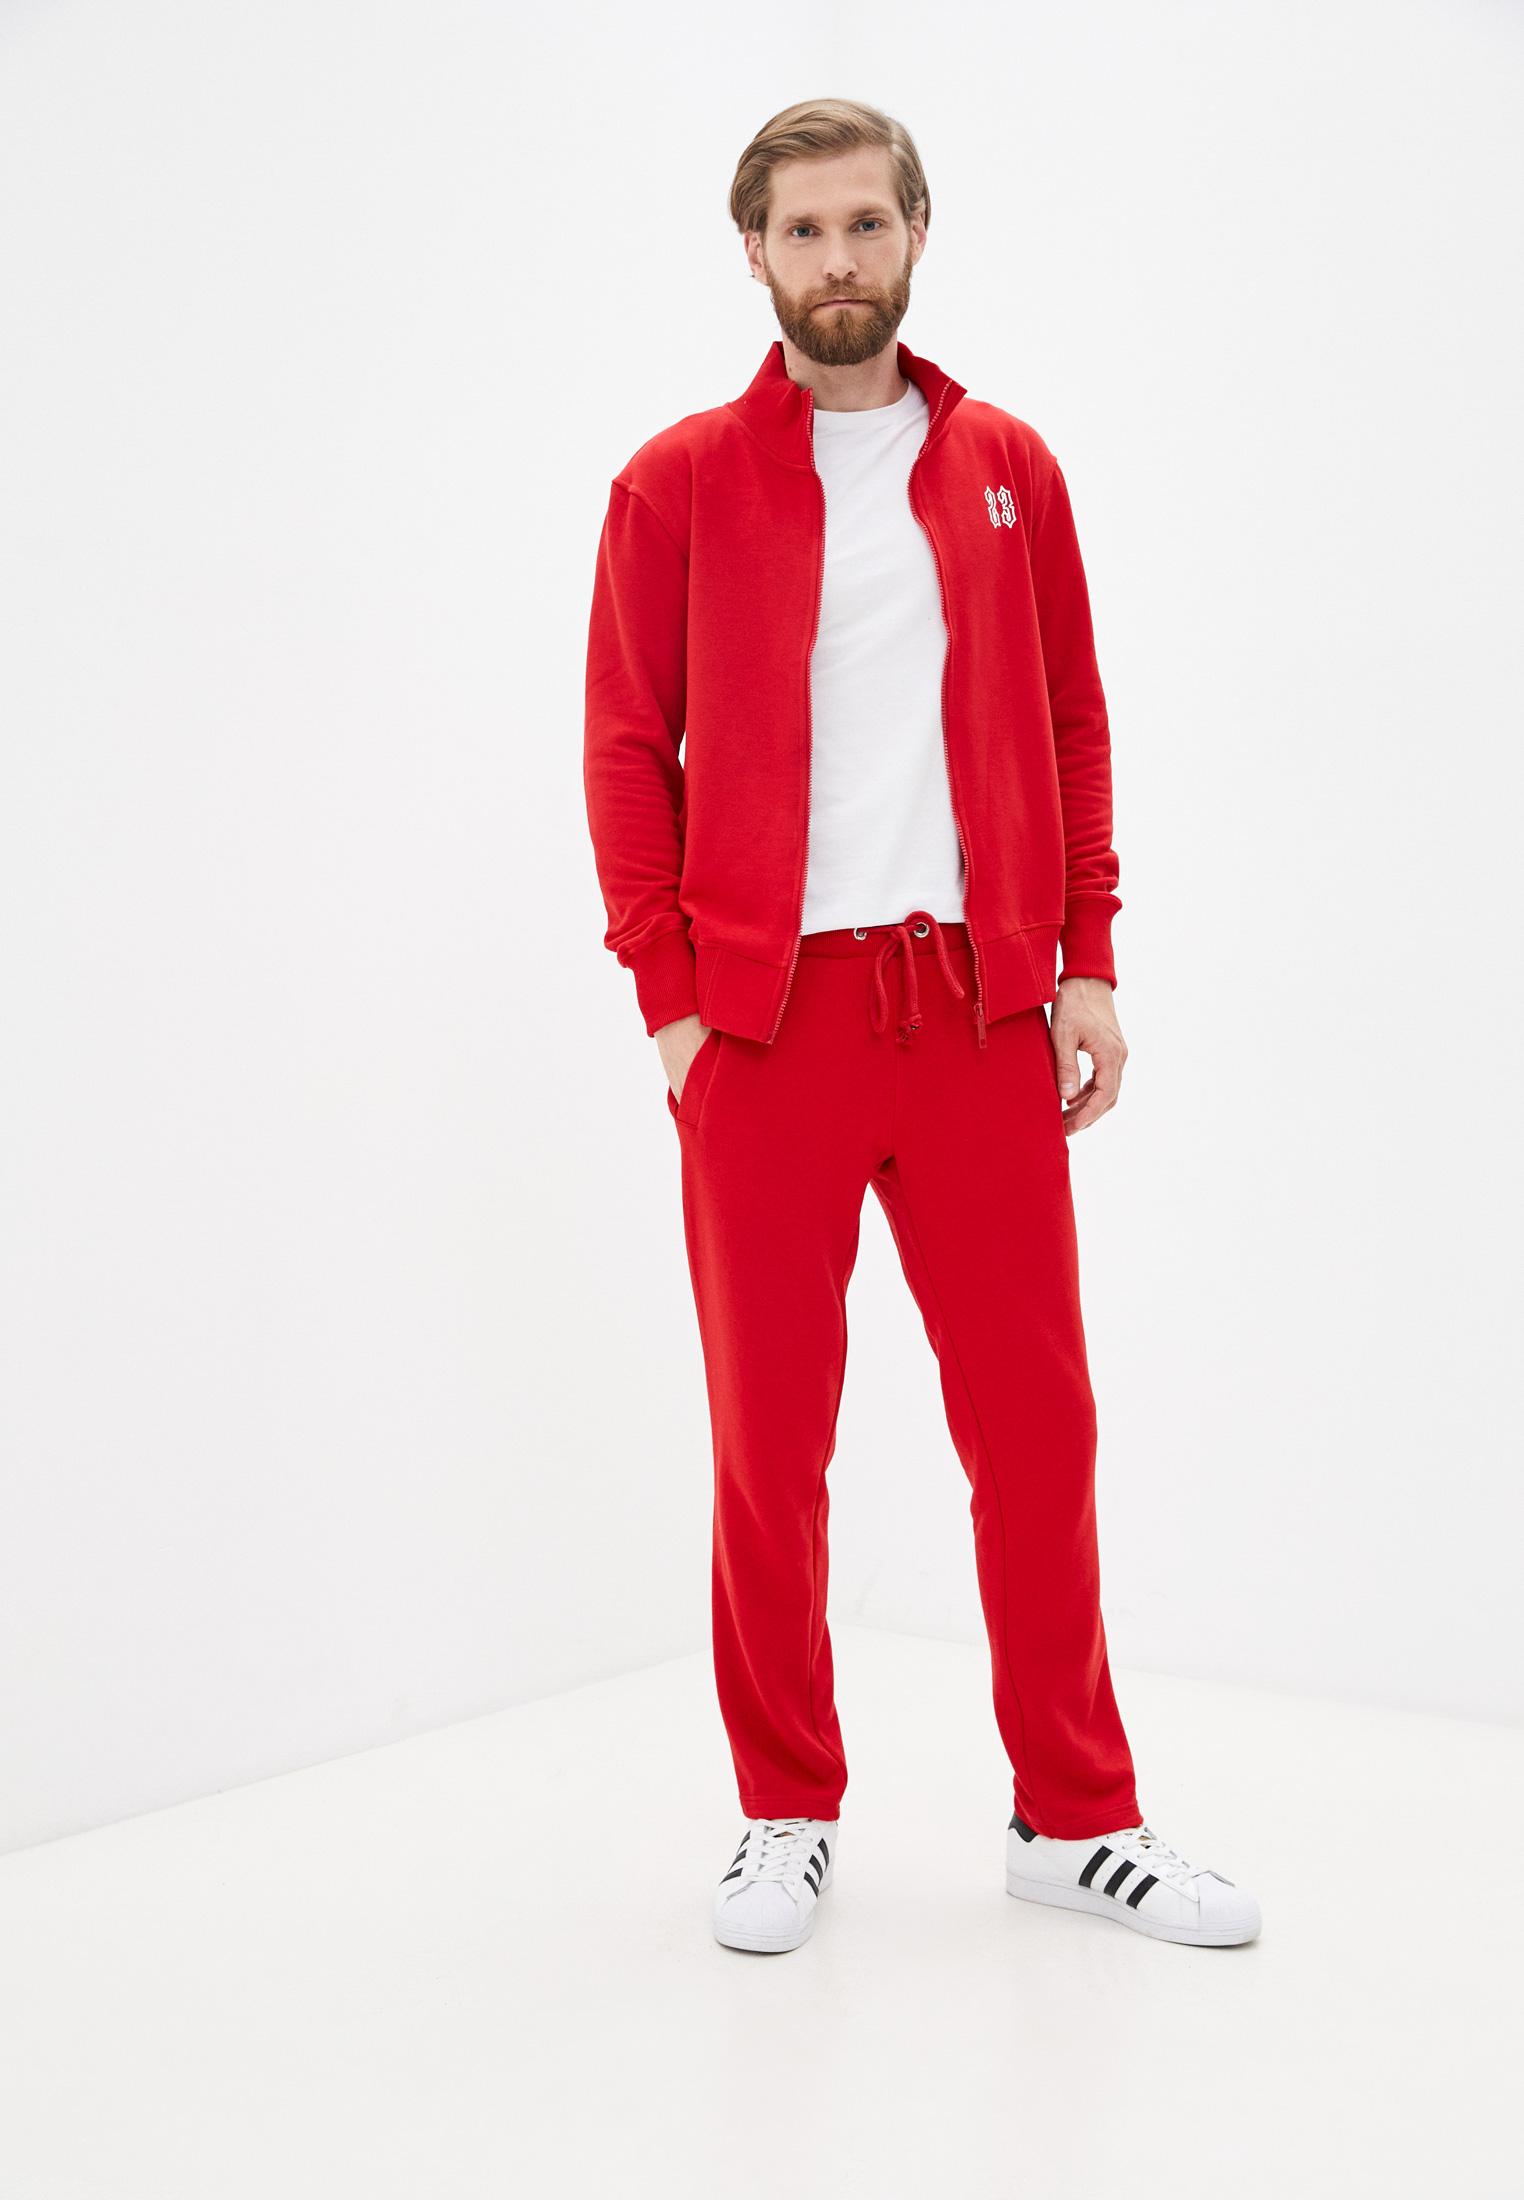 Спортивный костюм Sitlly 21824